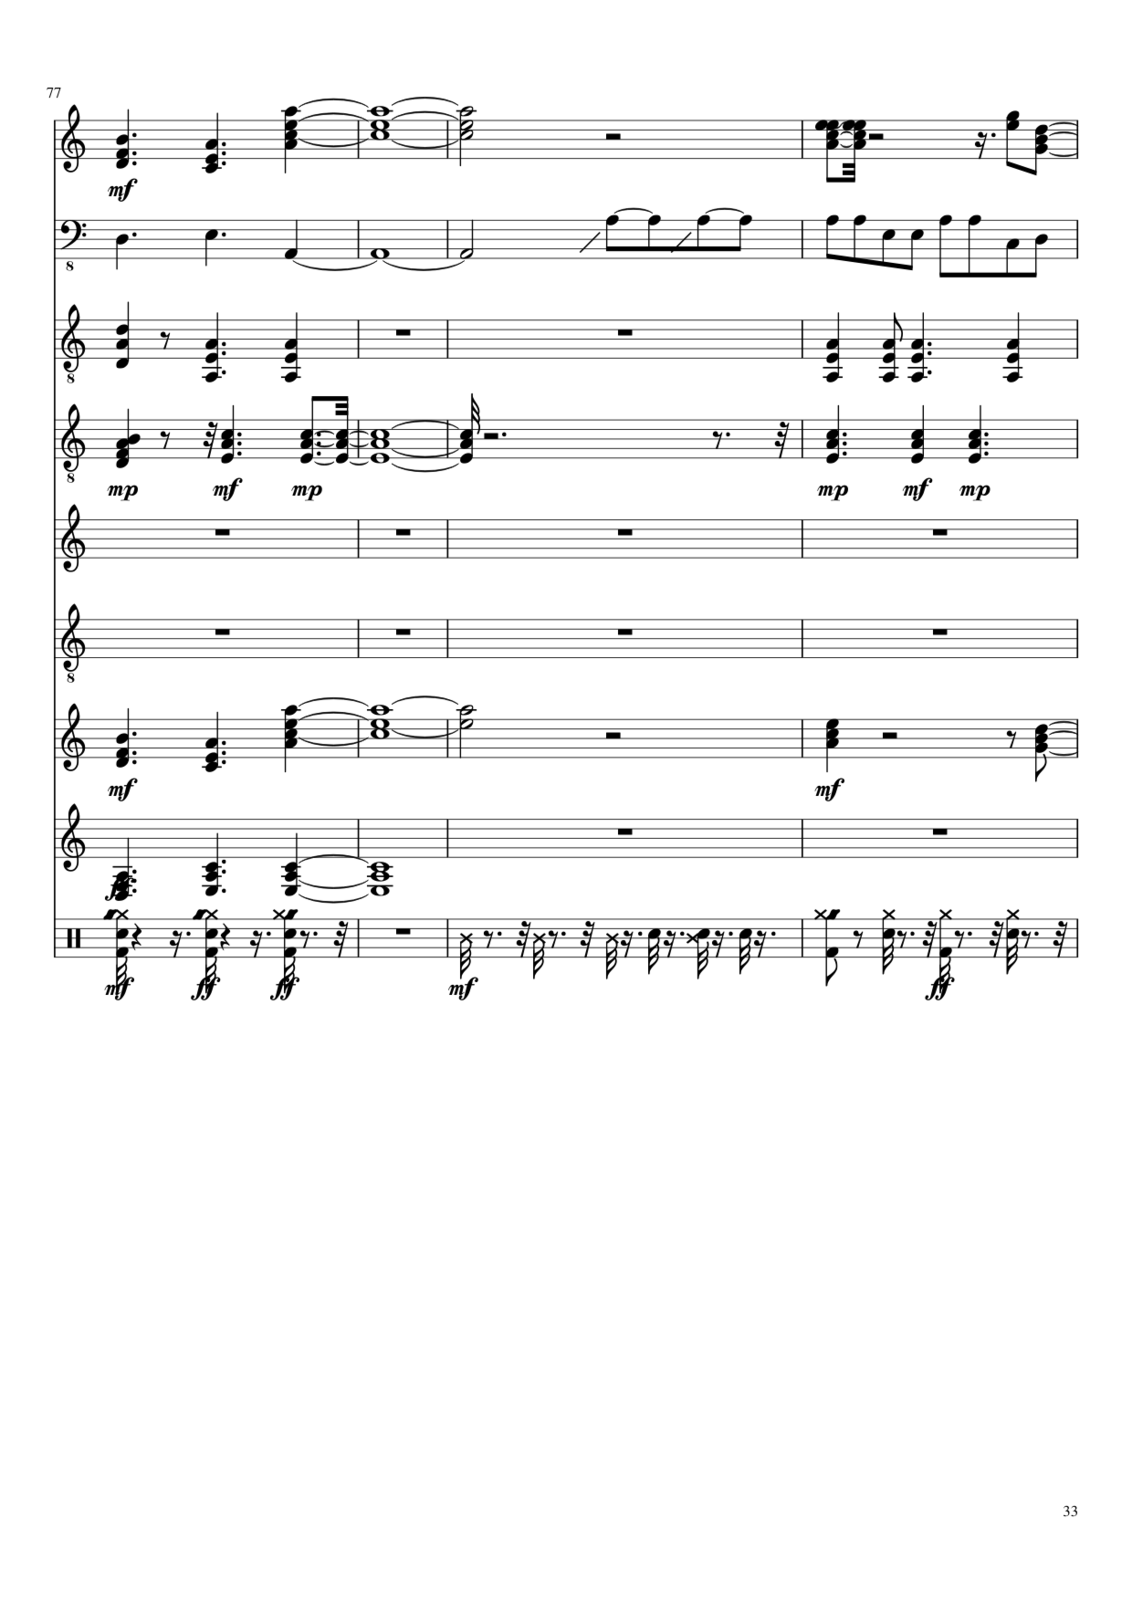 Mrs. Vandebilt slide, Image 33